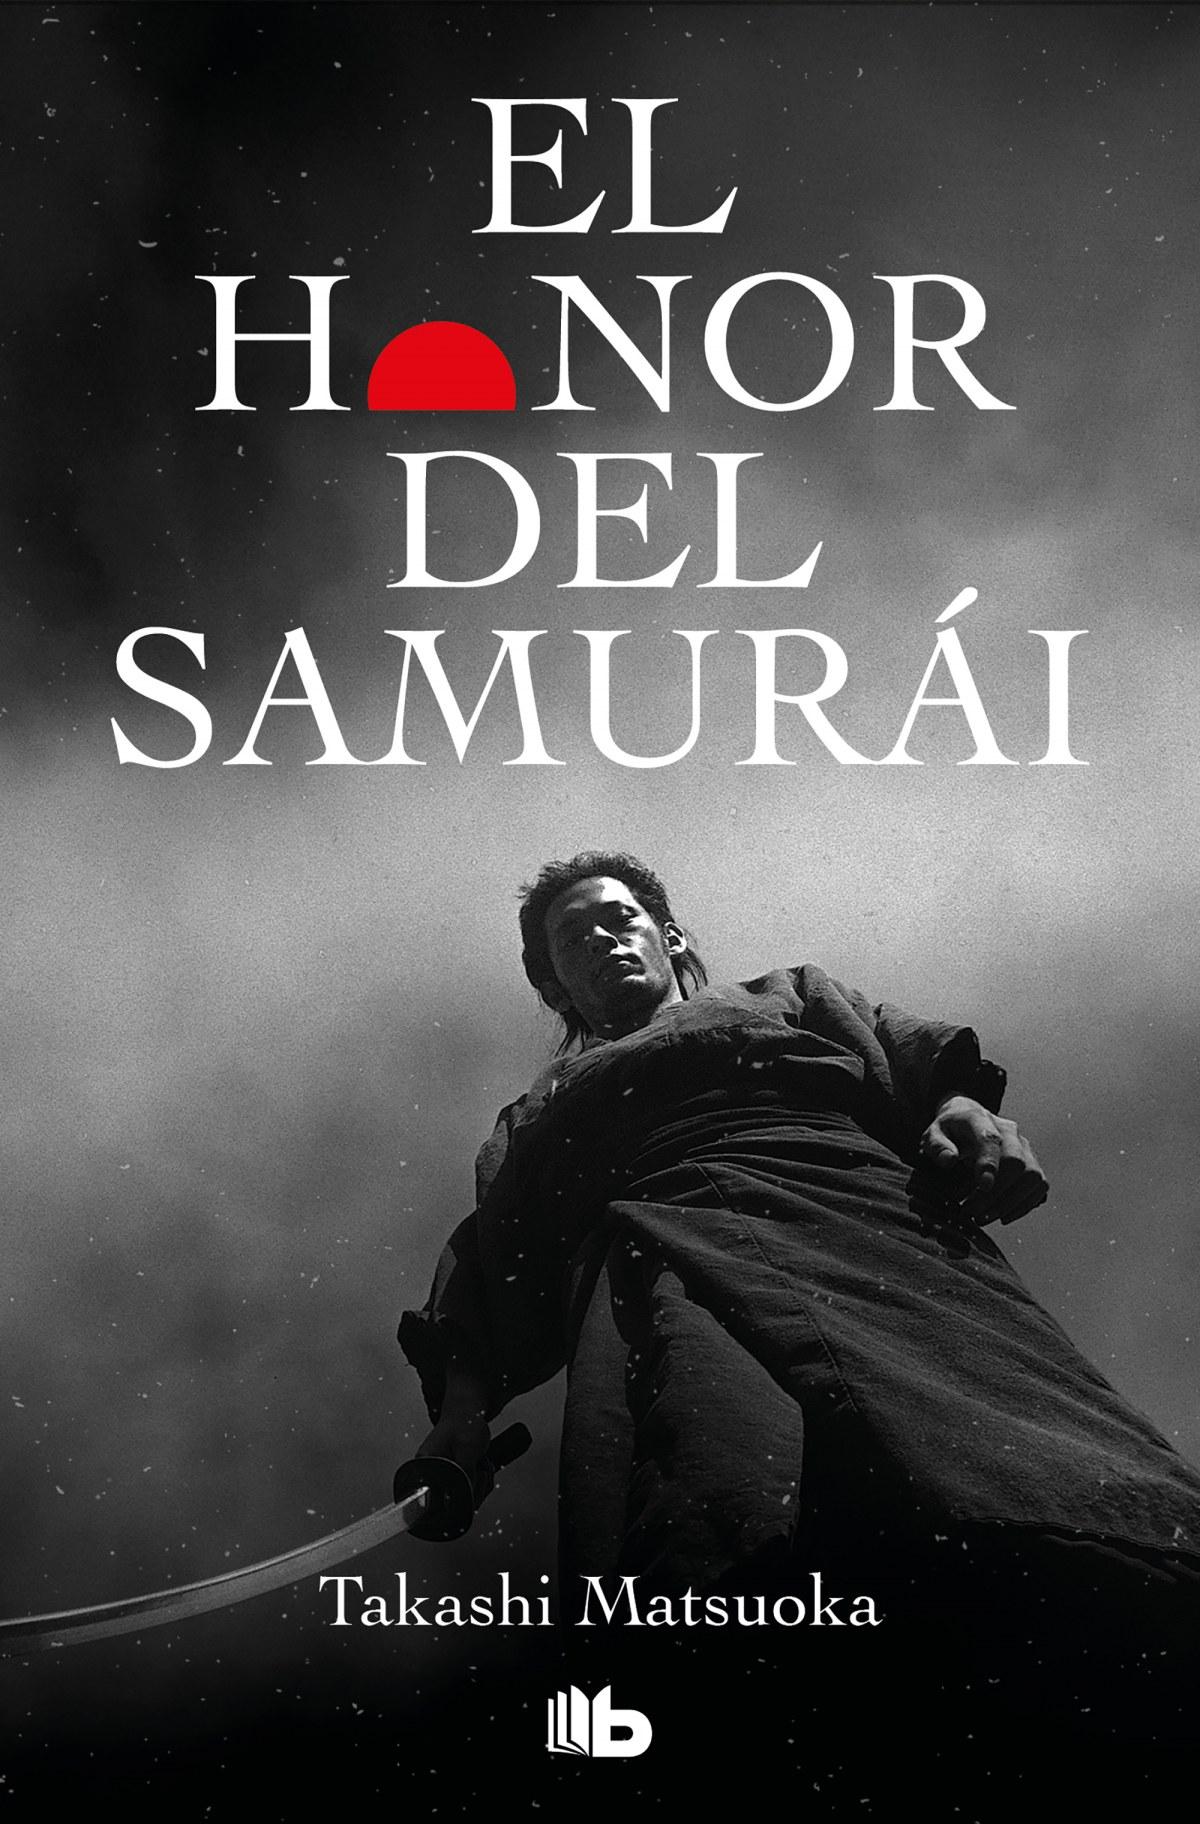 EL HONOR DEL SAMURAI